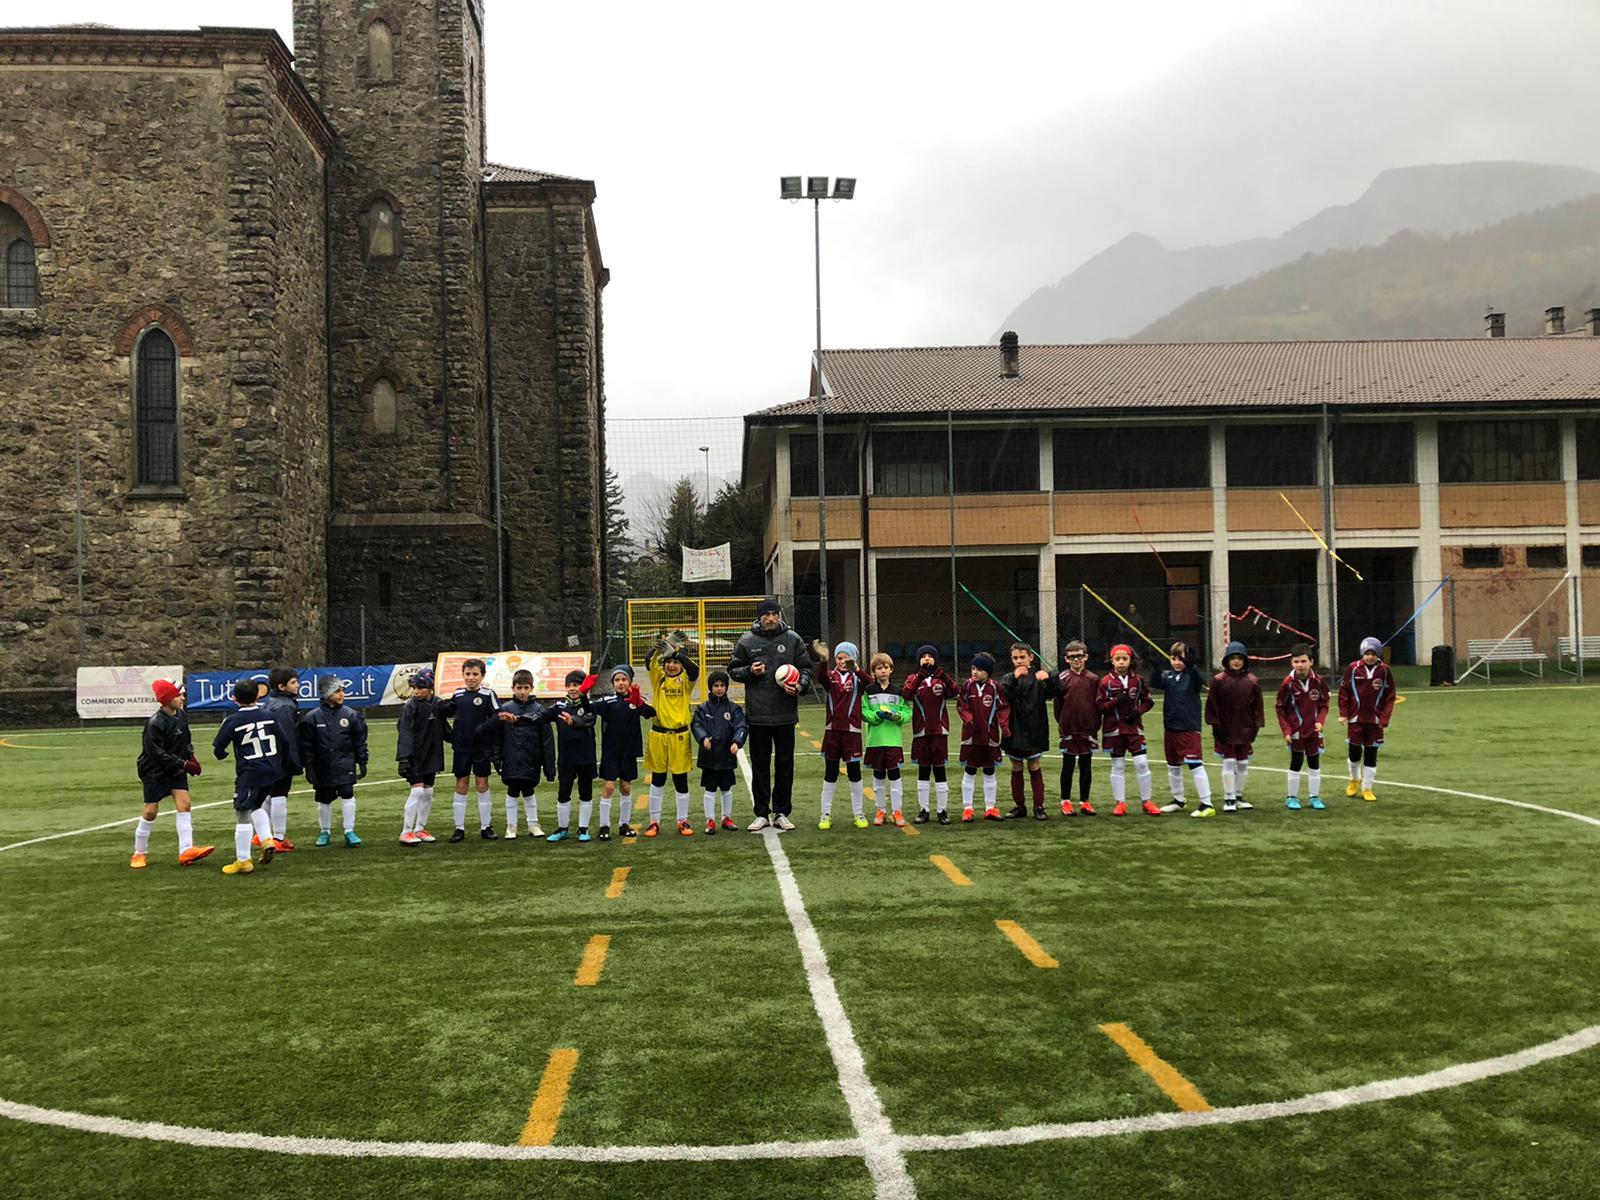 U10 Ballabio Bellano 2019